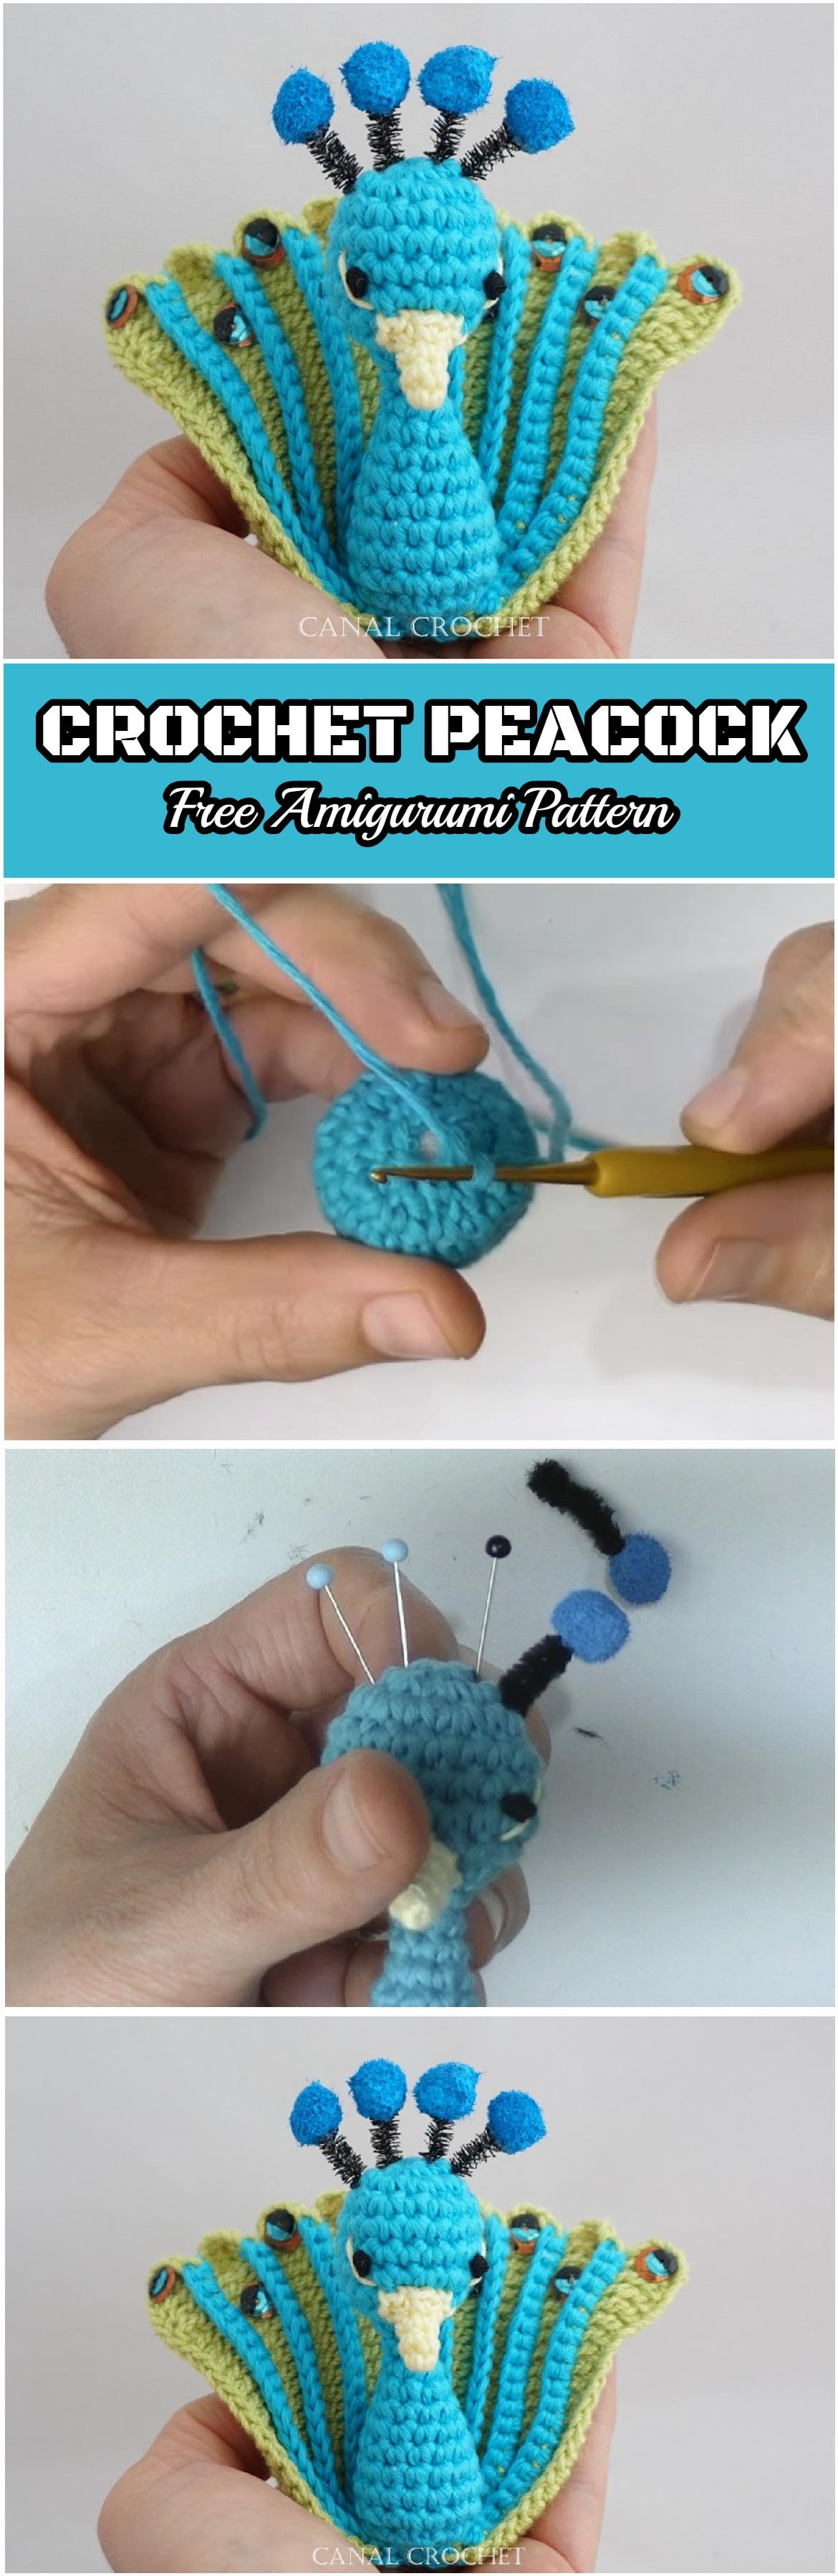 Crochet Peacock Free Amigurumi Pattern Yarn Hooks